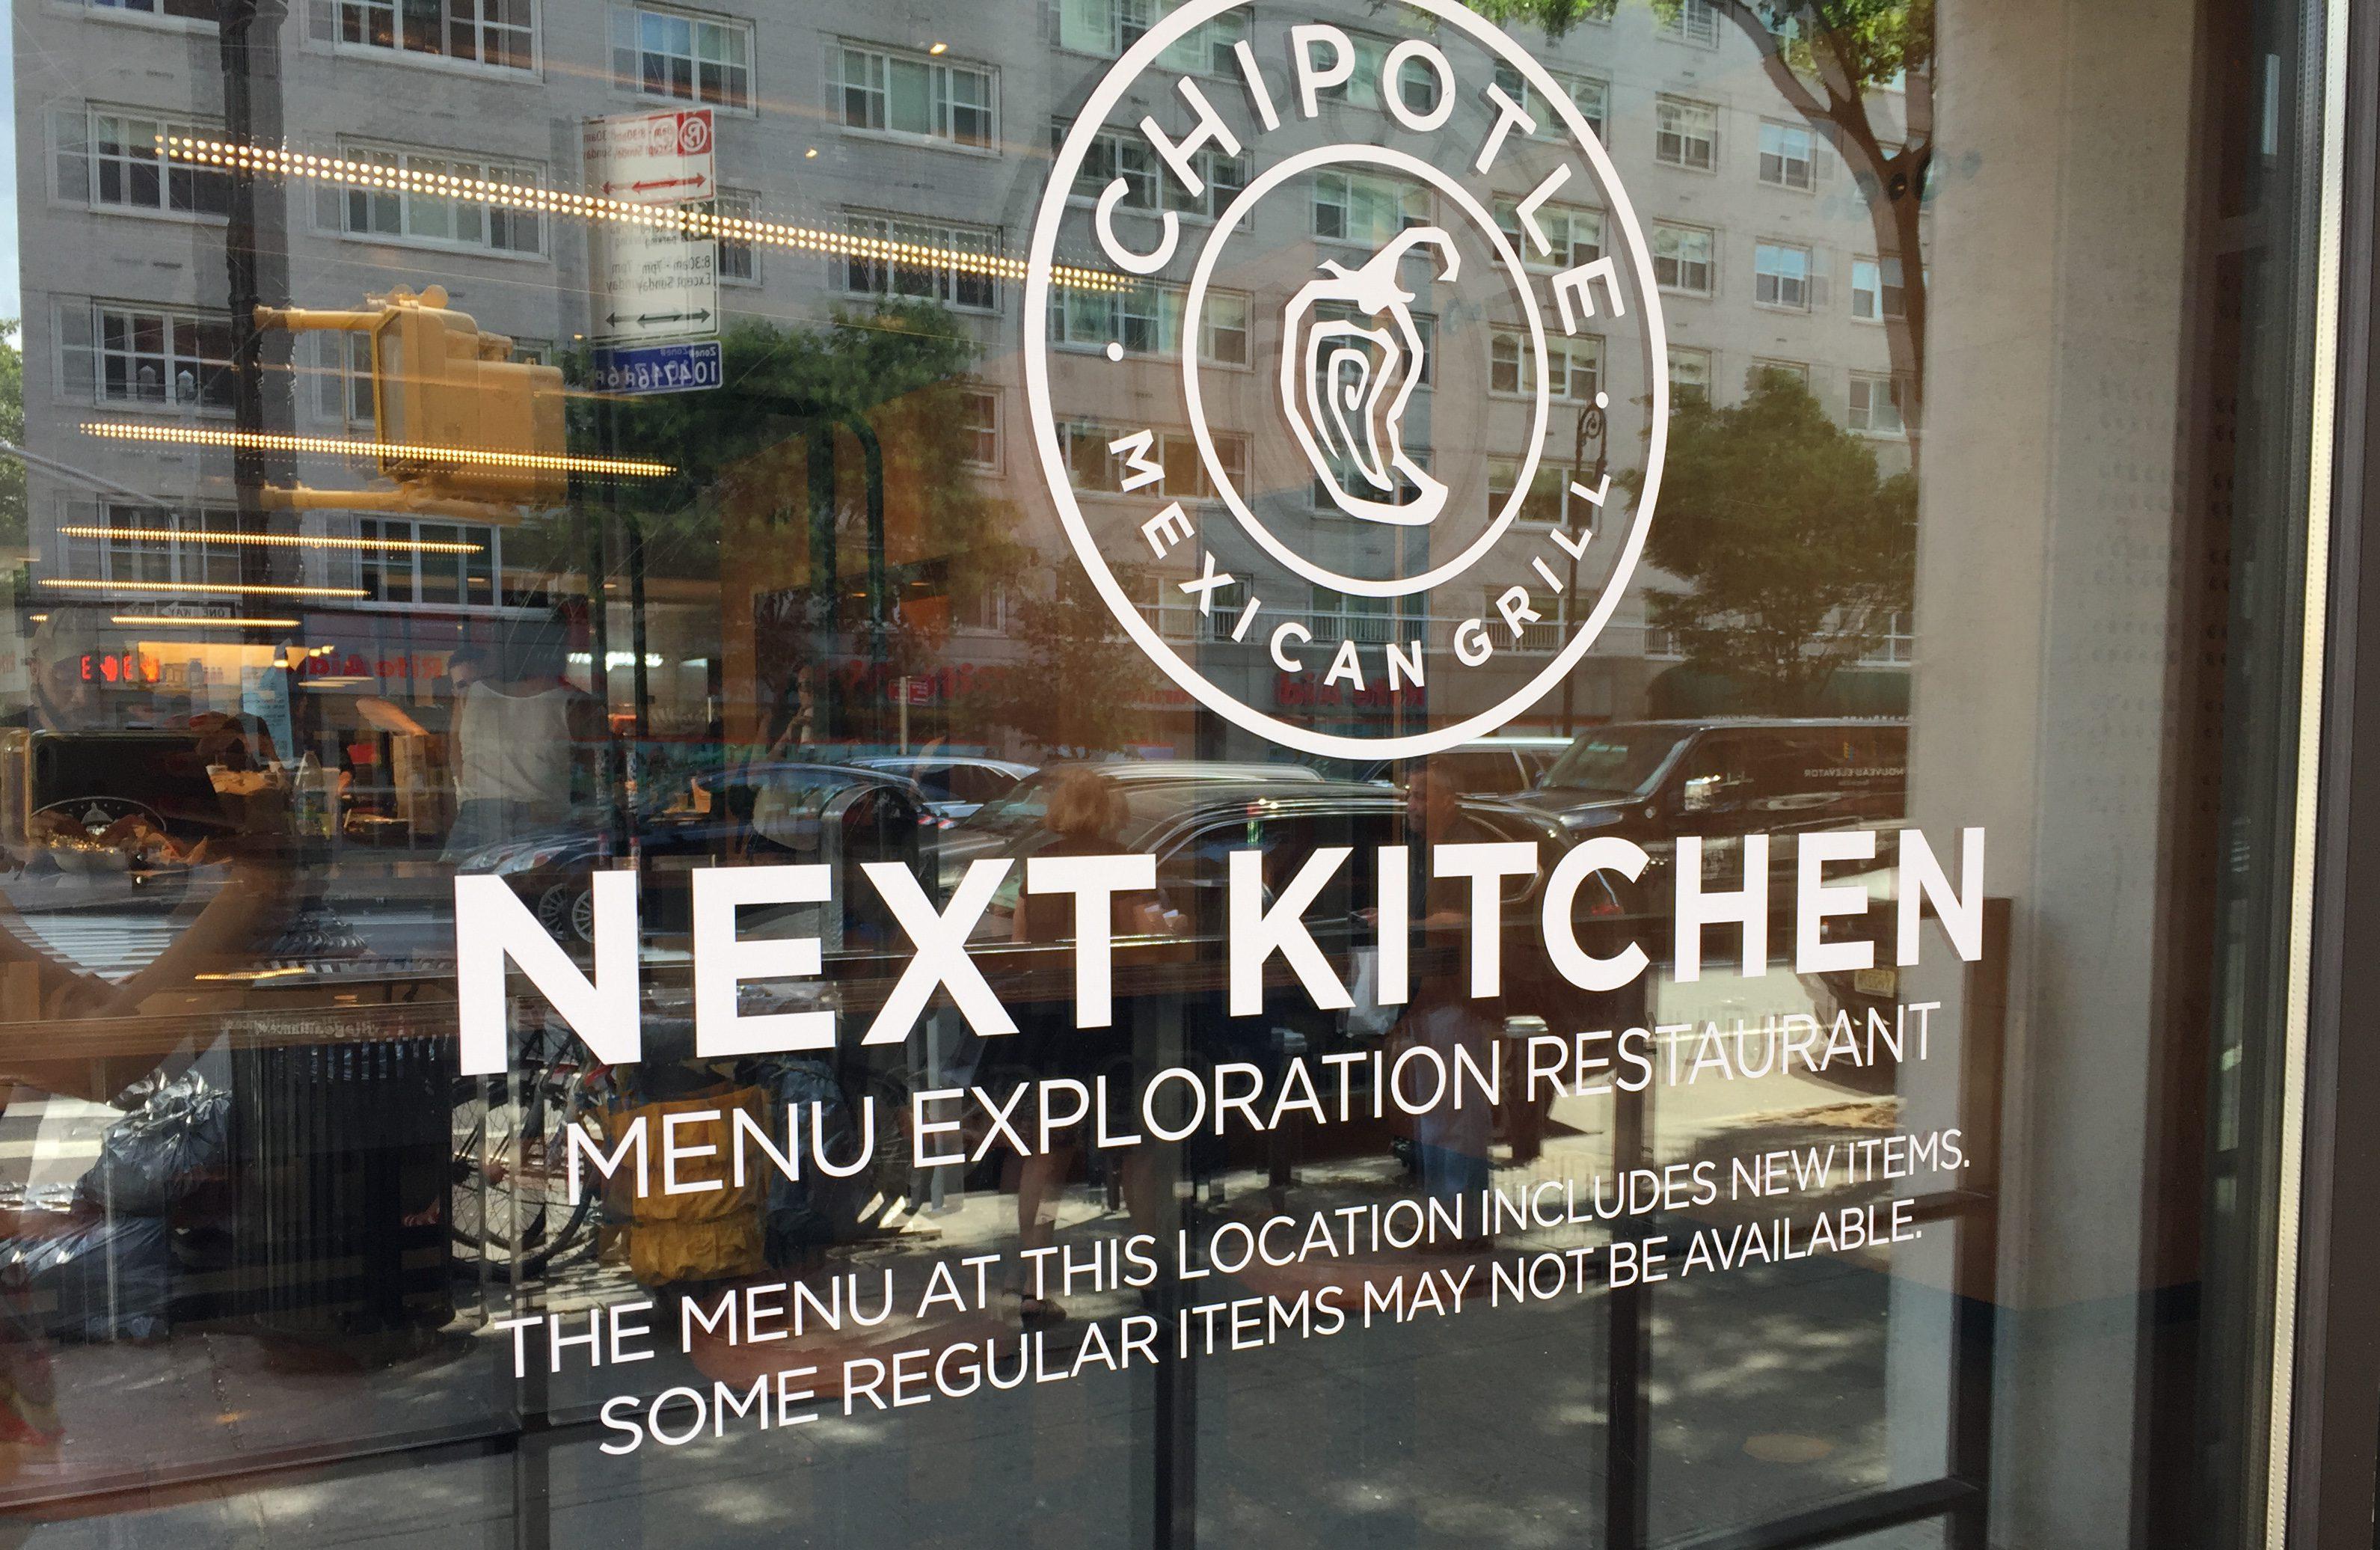 Chipotle opened NEXT Kitchen, it's first public-facing test kitchen in Manhattan on Monday.